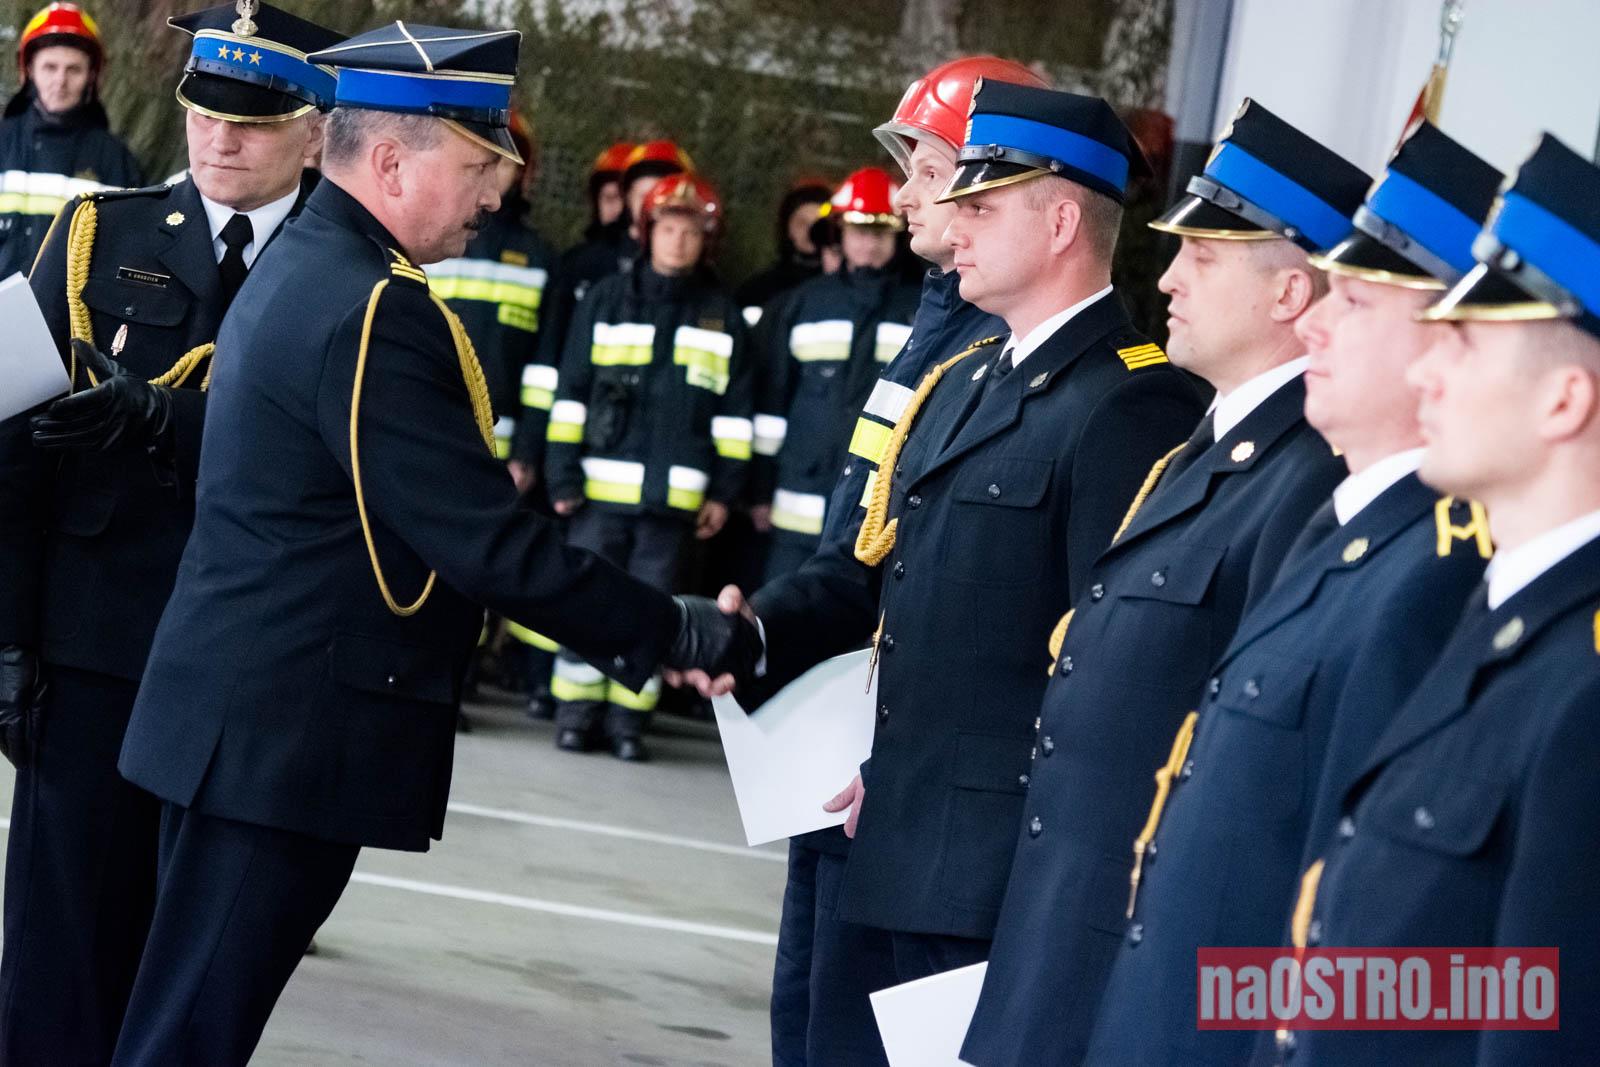 NaOSTRO dzień strażaka-19